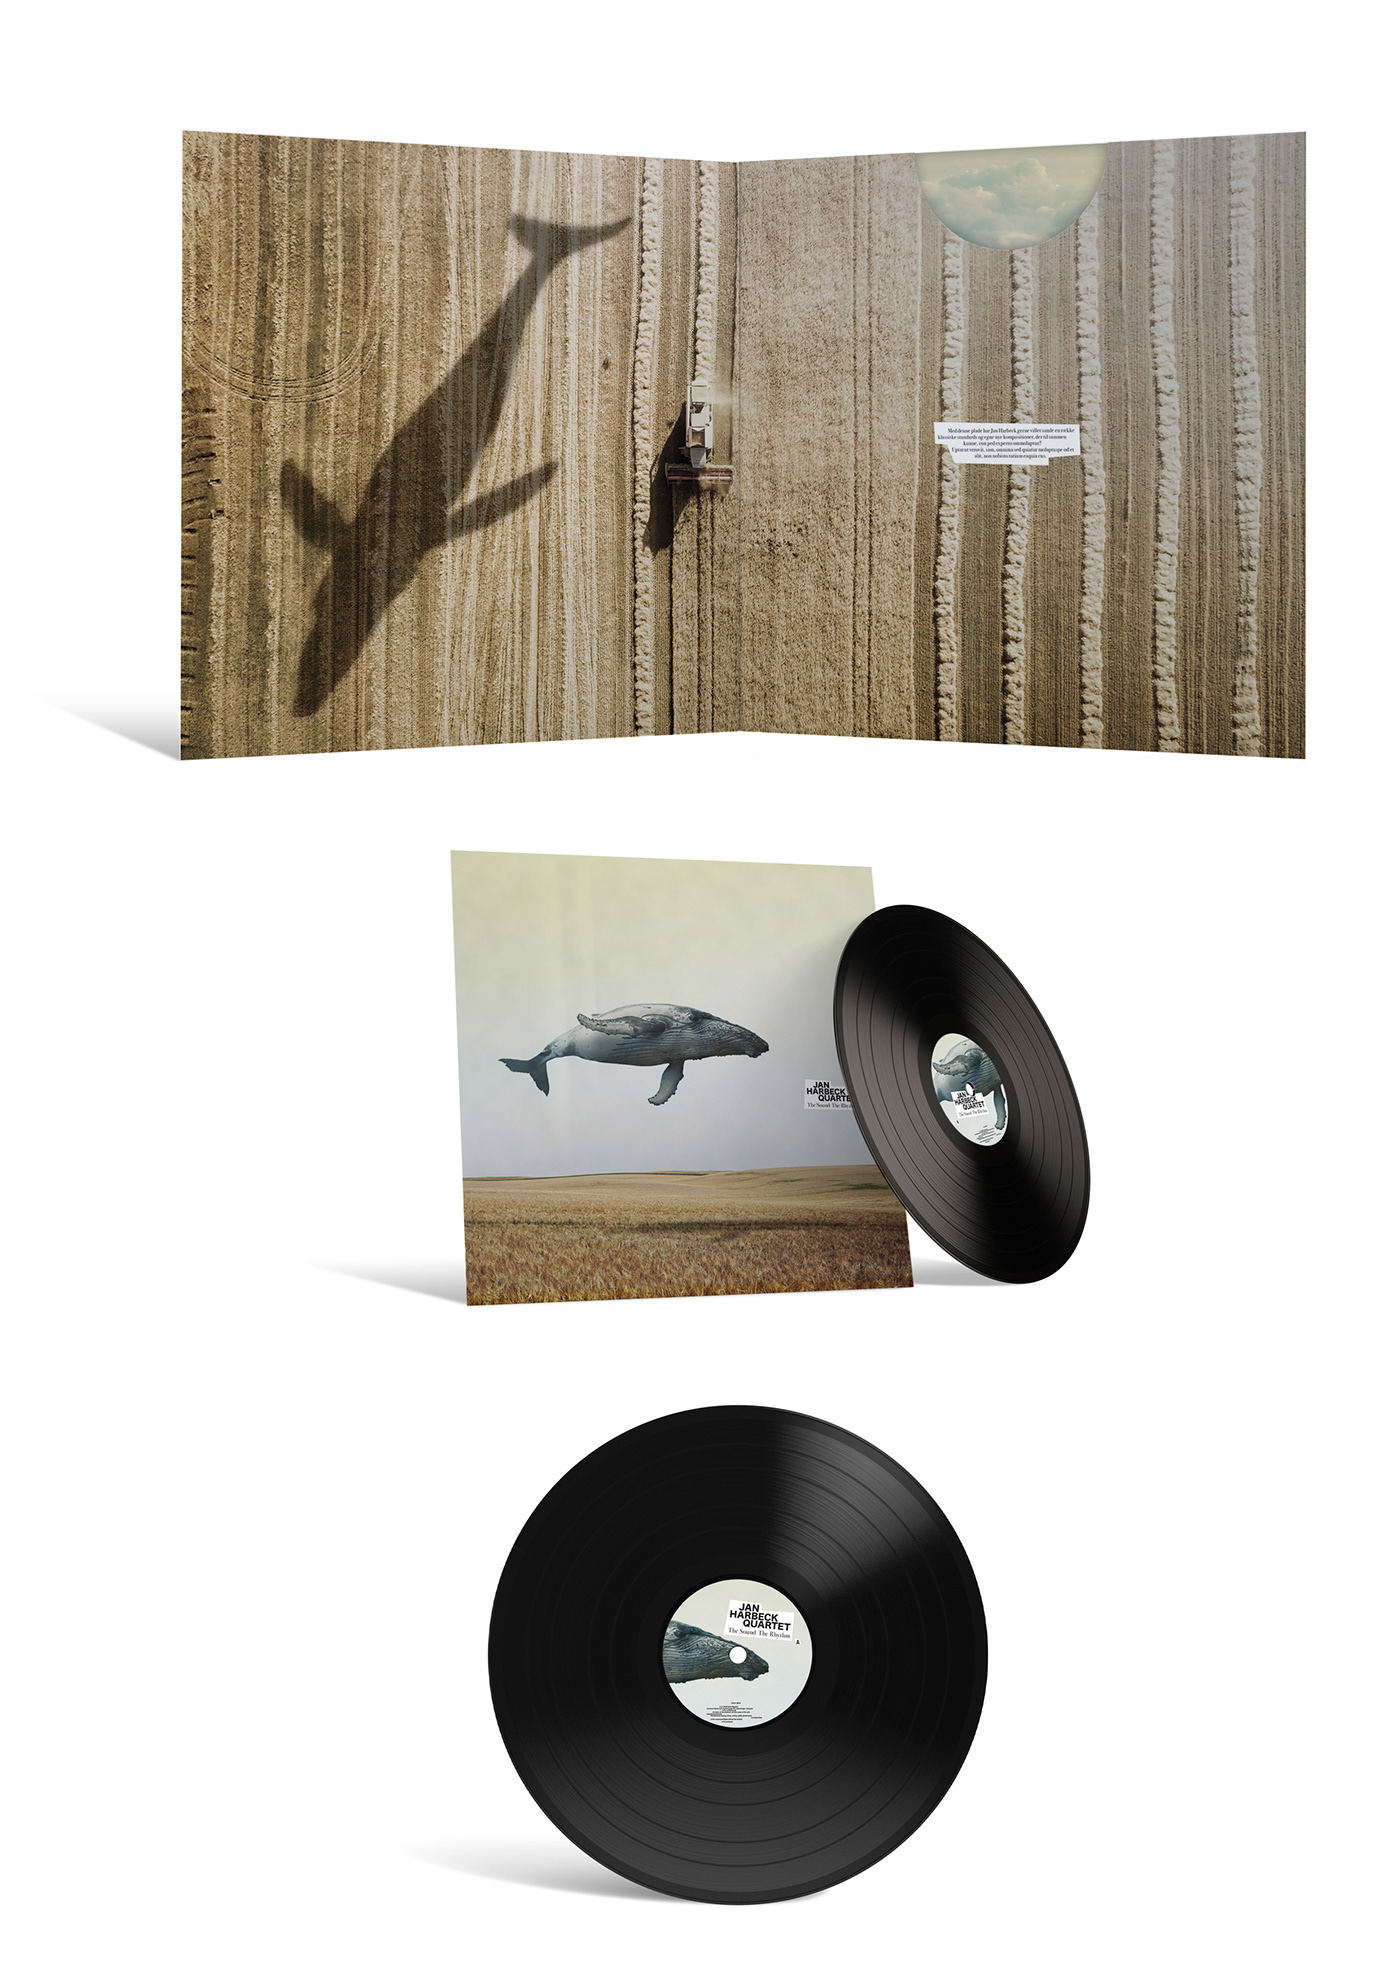 vinyl cover album cover Packaging